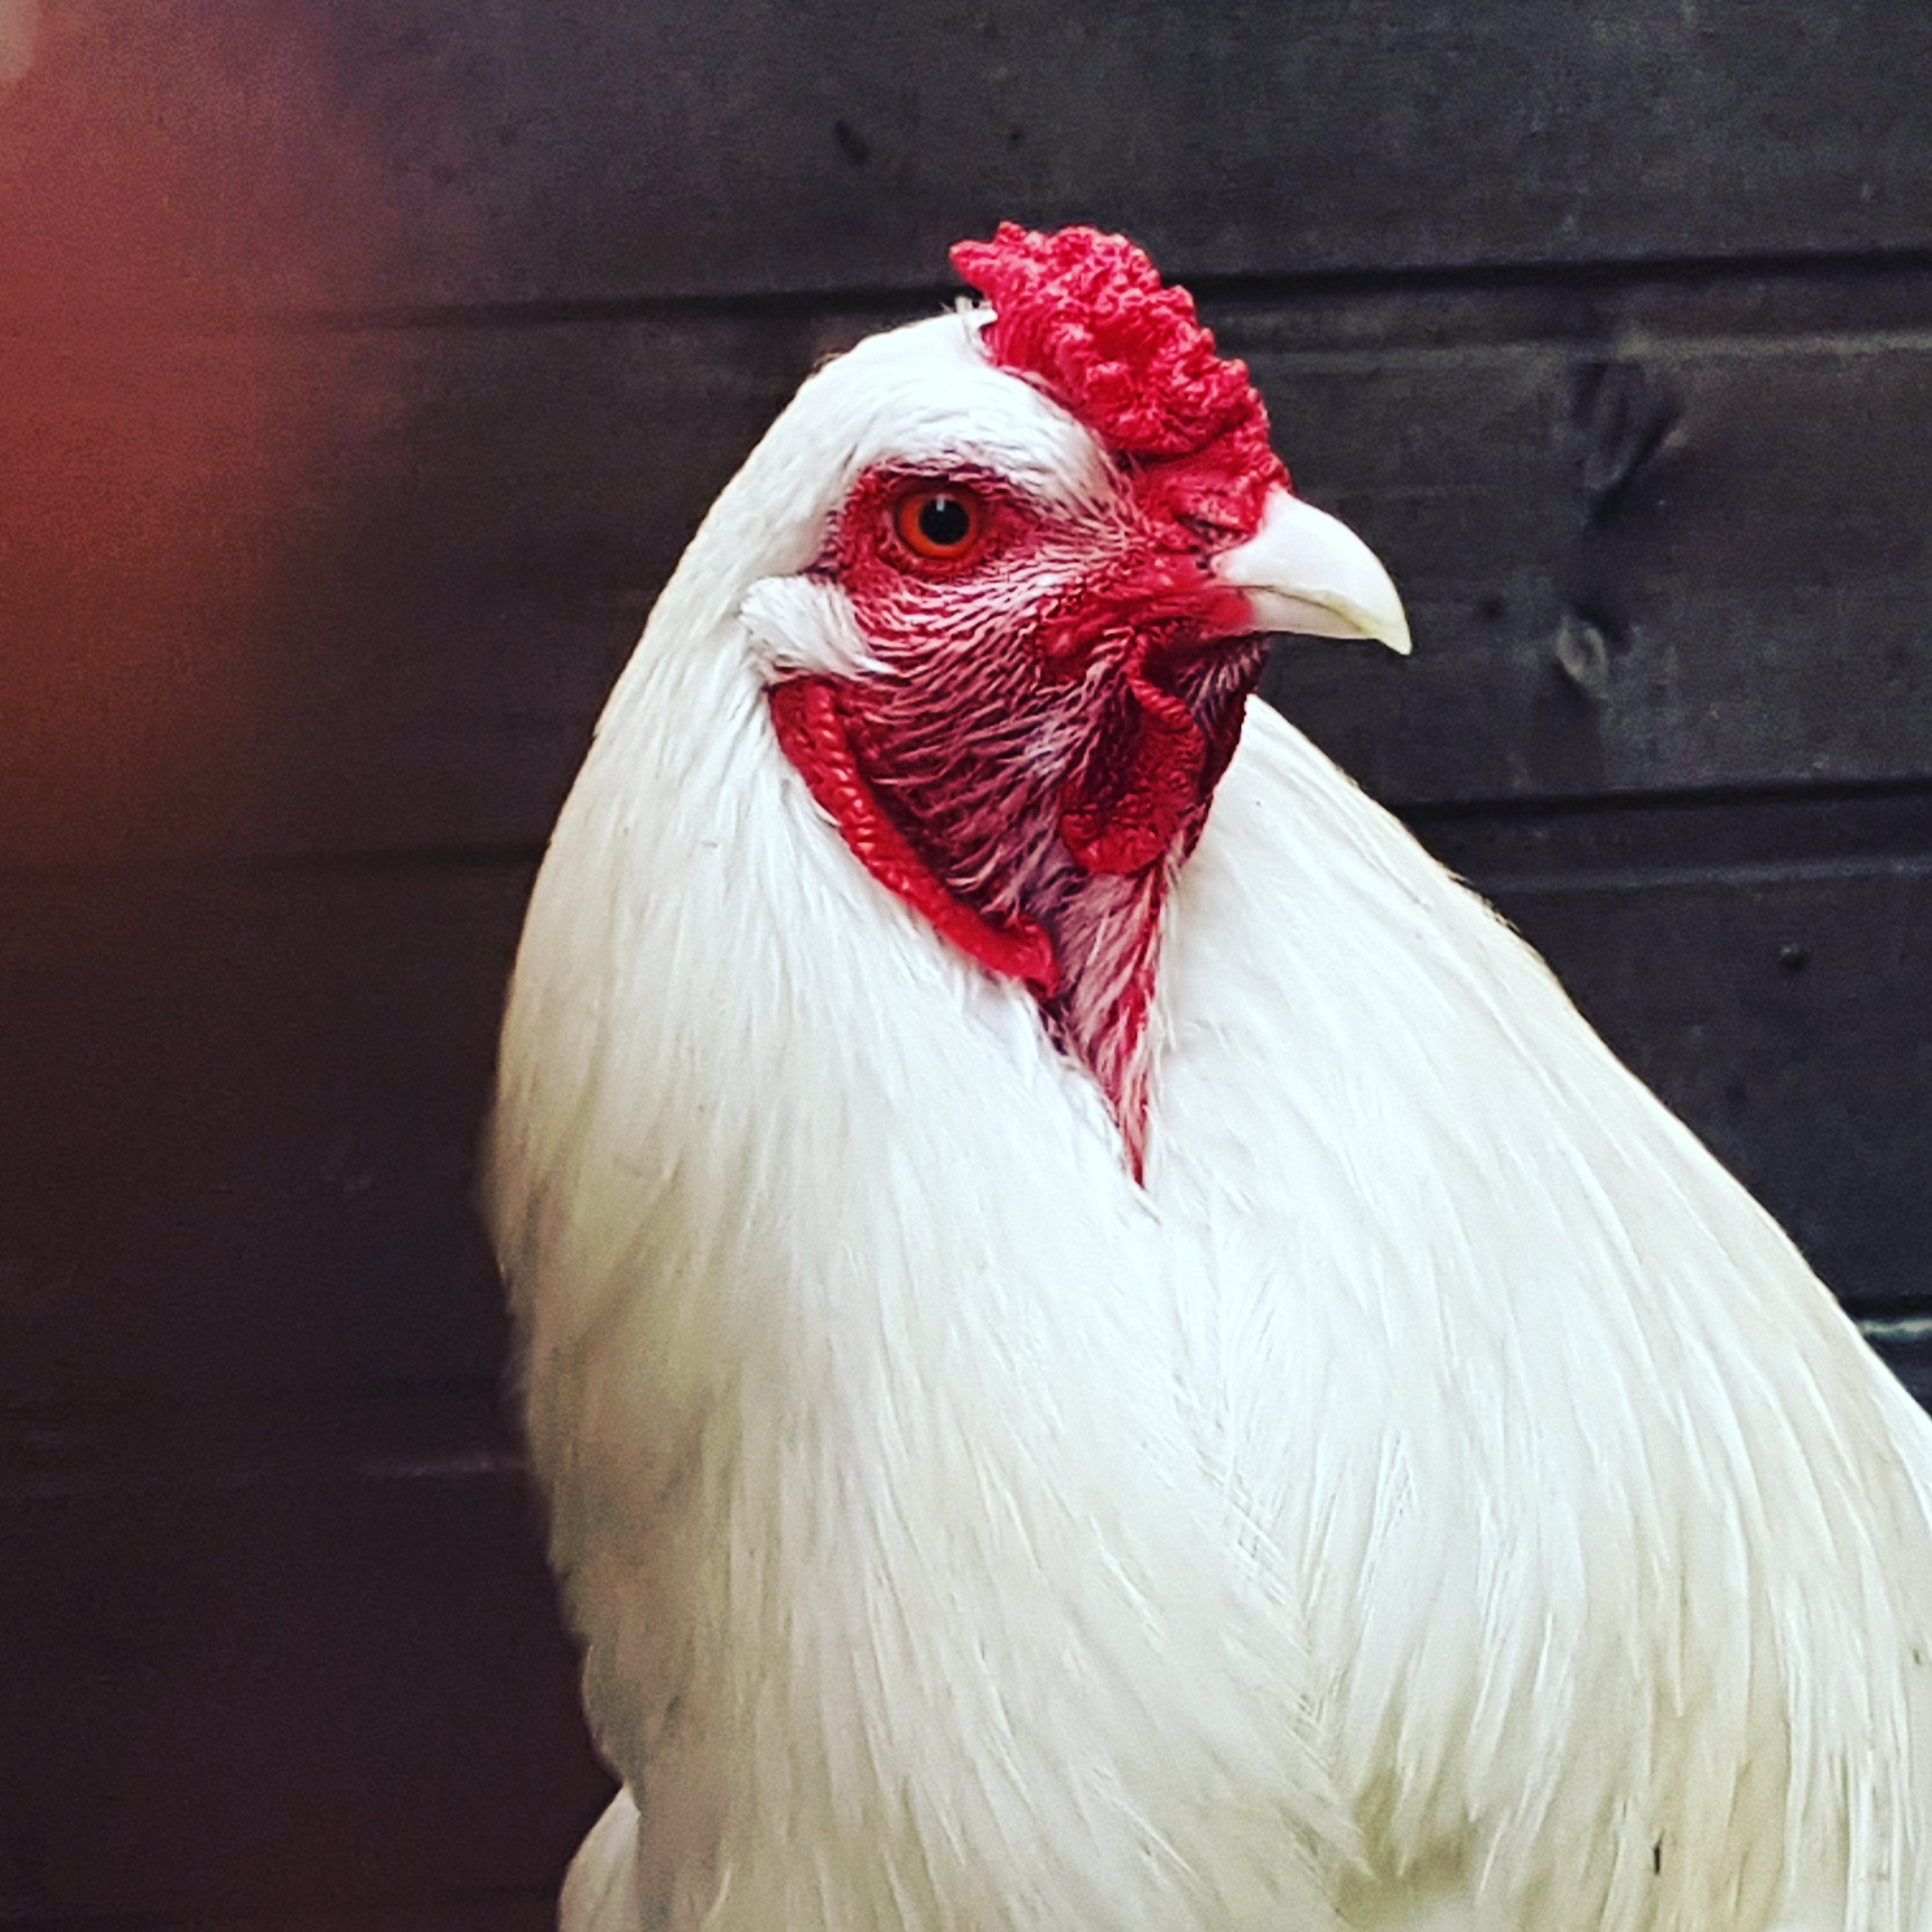 Mature Ixworth cockerel